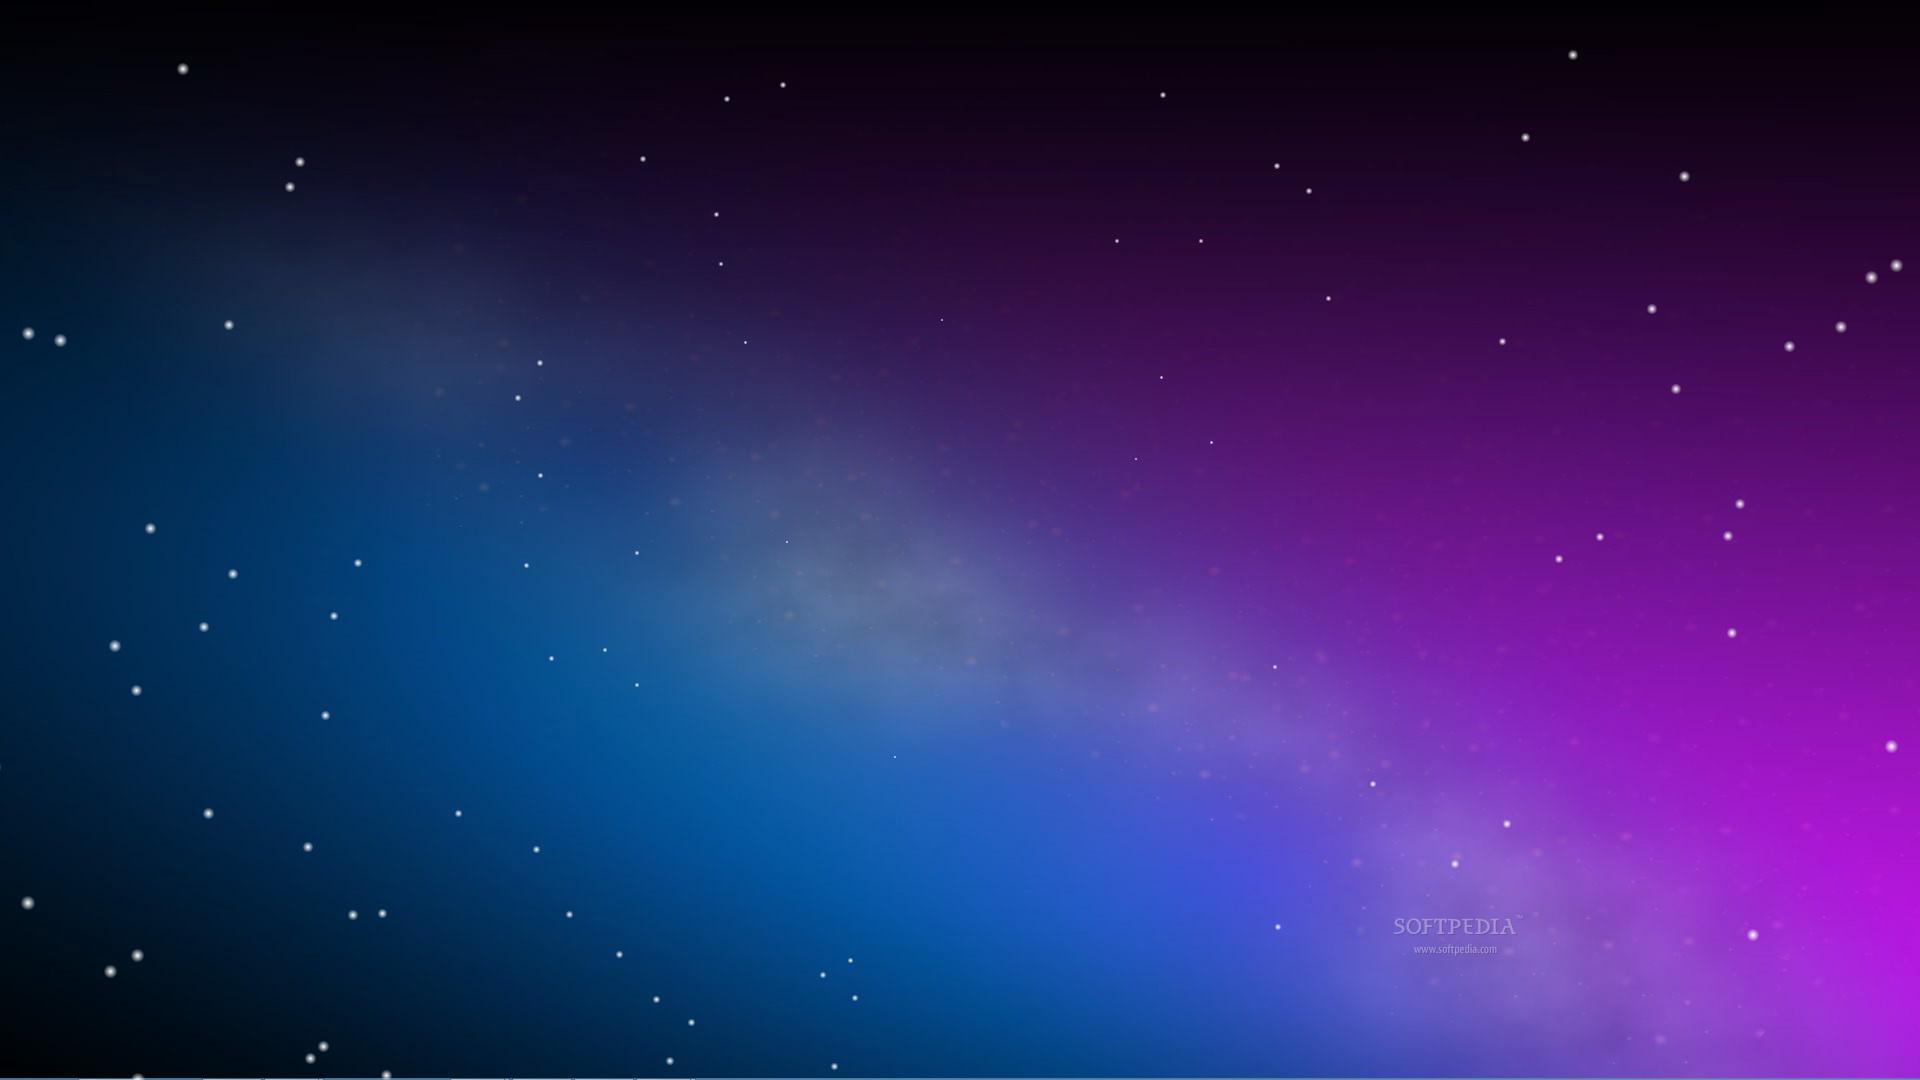 Animated Starfield Desktop Wallpaper截图1